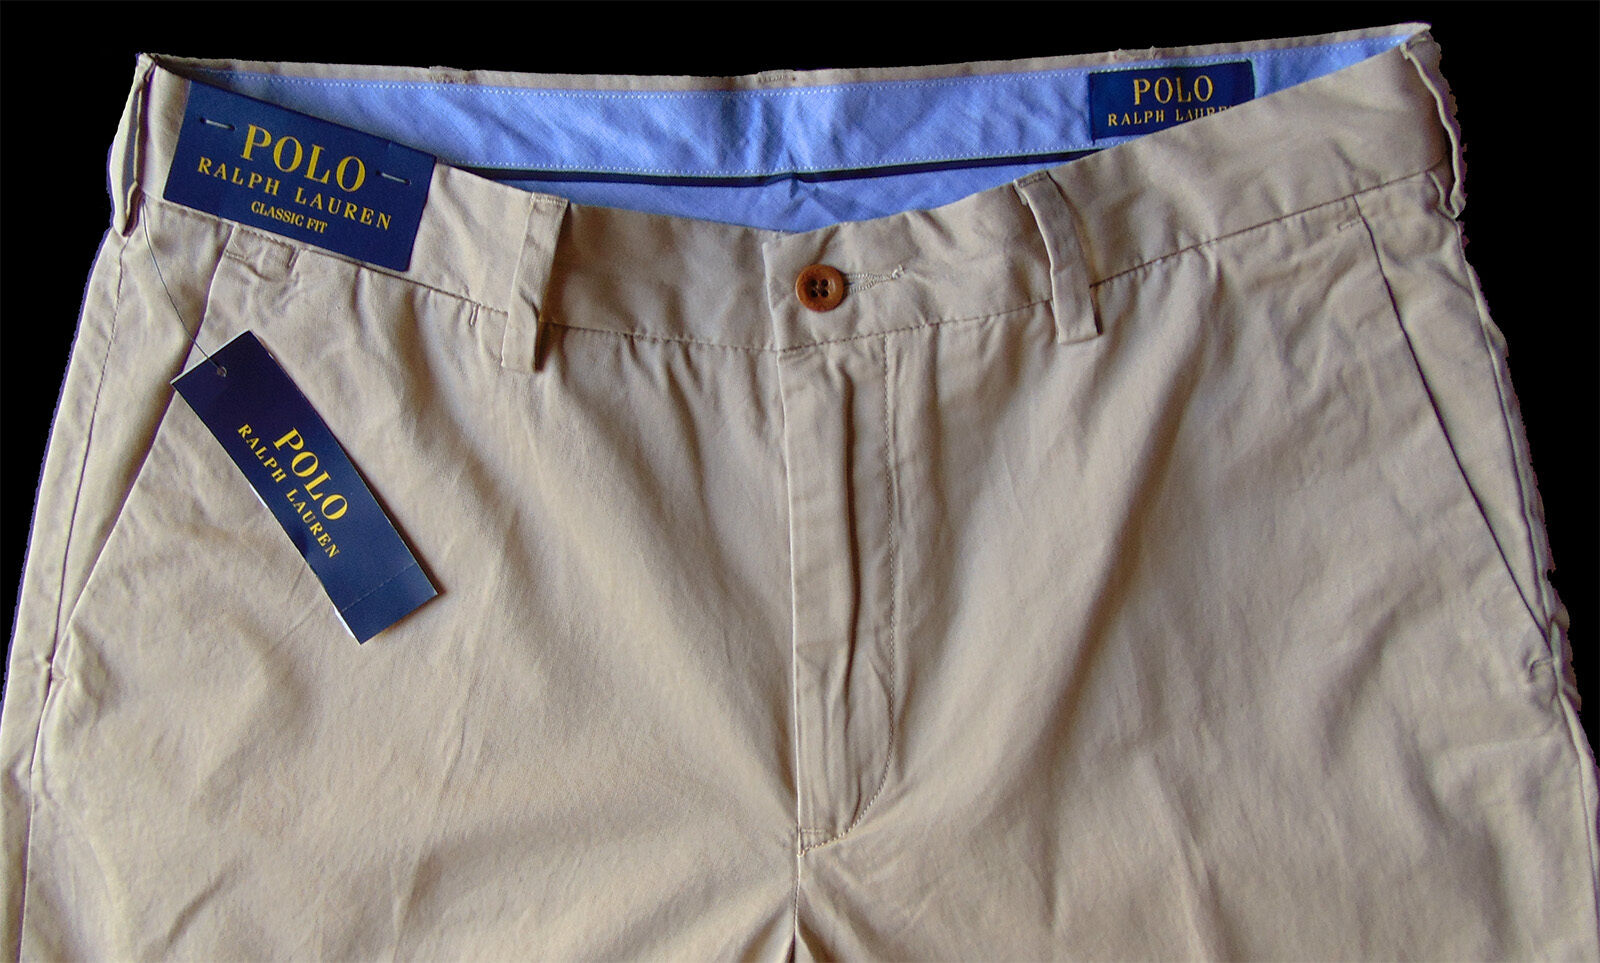 Men's POLO RALPH LAUREN Boating Khaki Pima Cotton Pants 30x30 NEW NWT Classic